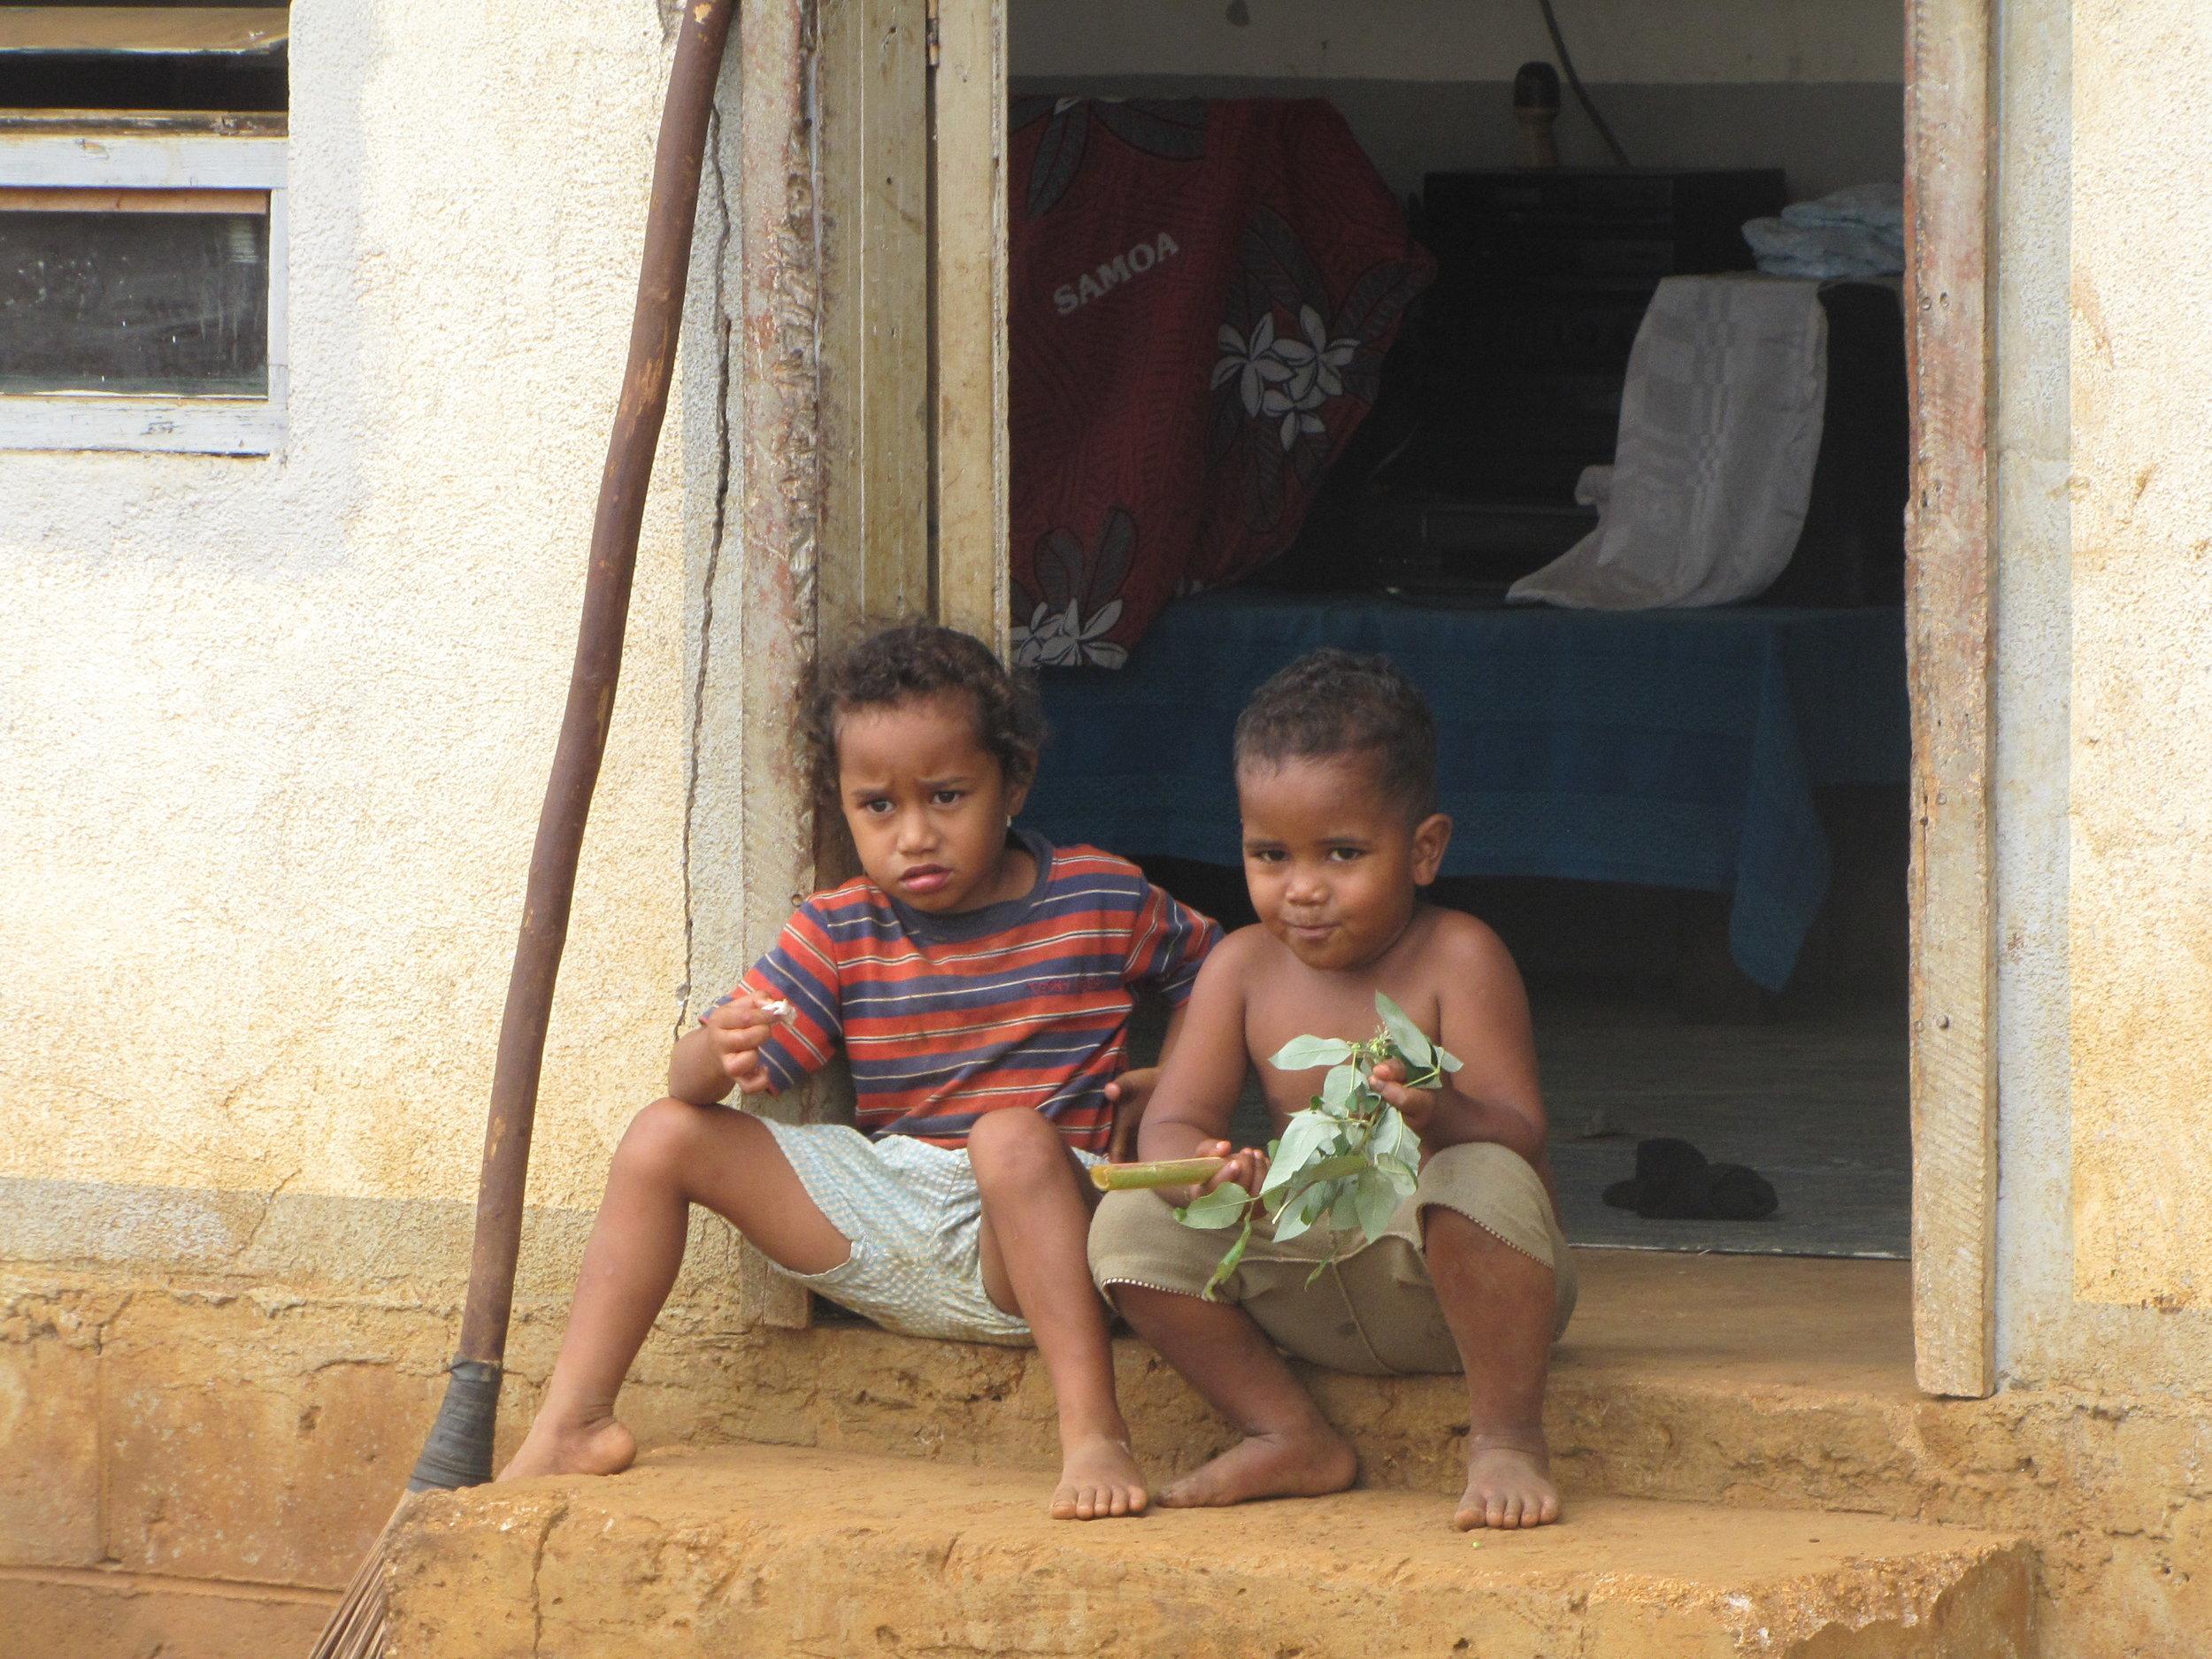 Local kids sitting in a doorway